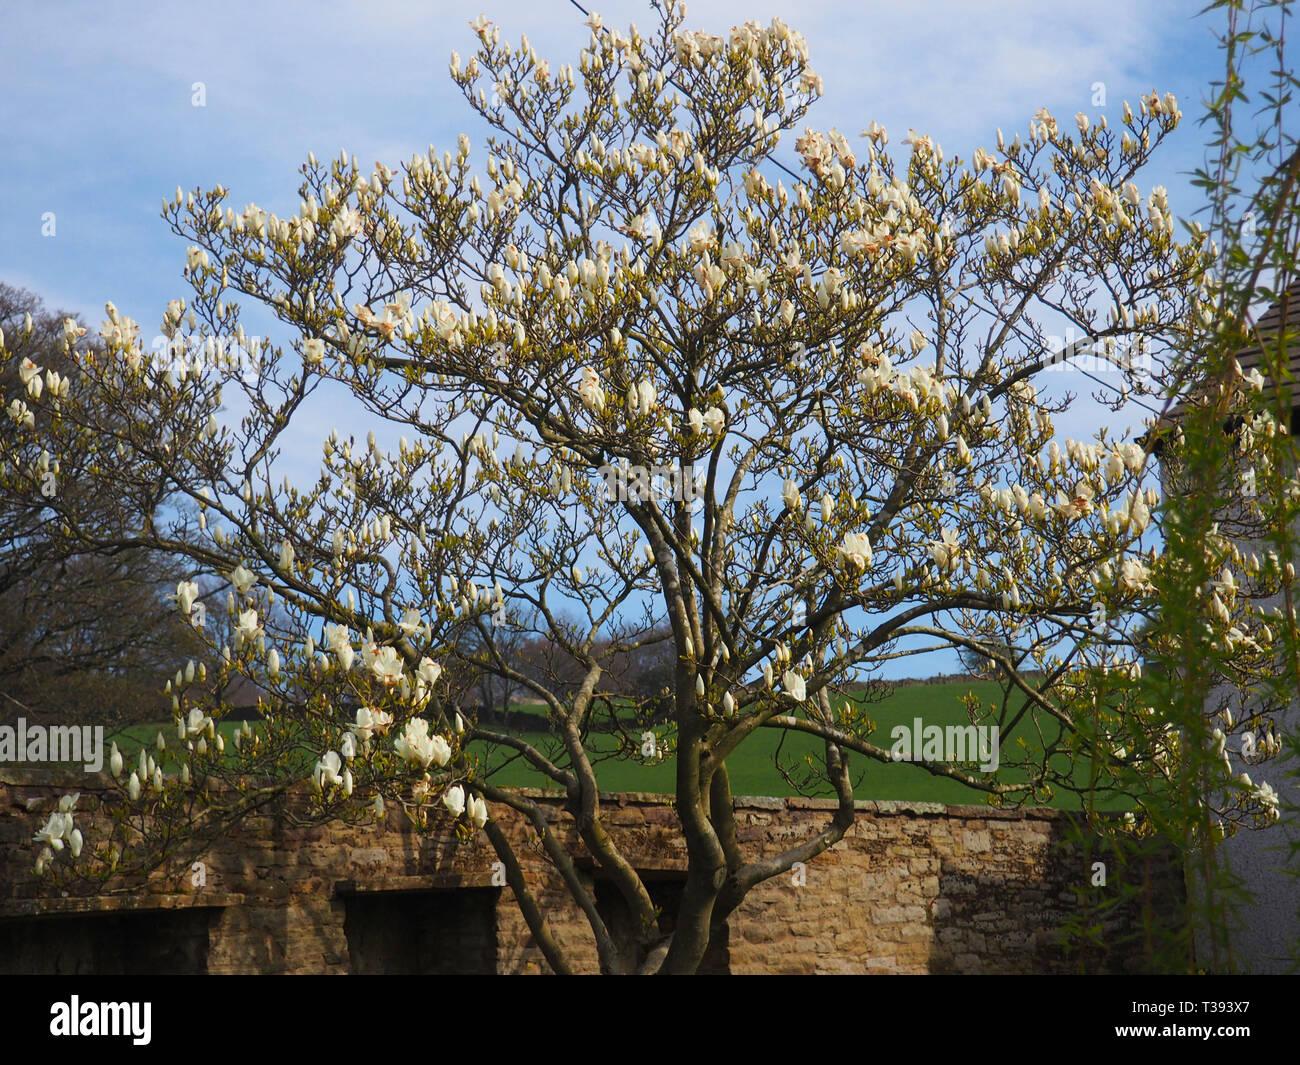 Magnolia blossom, Bollington, Cheshire, UK Stock Photo